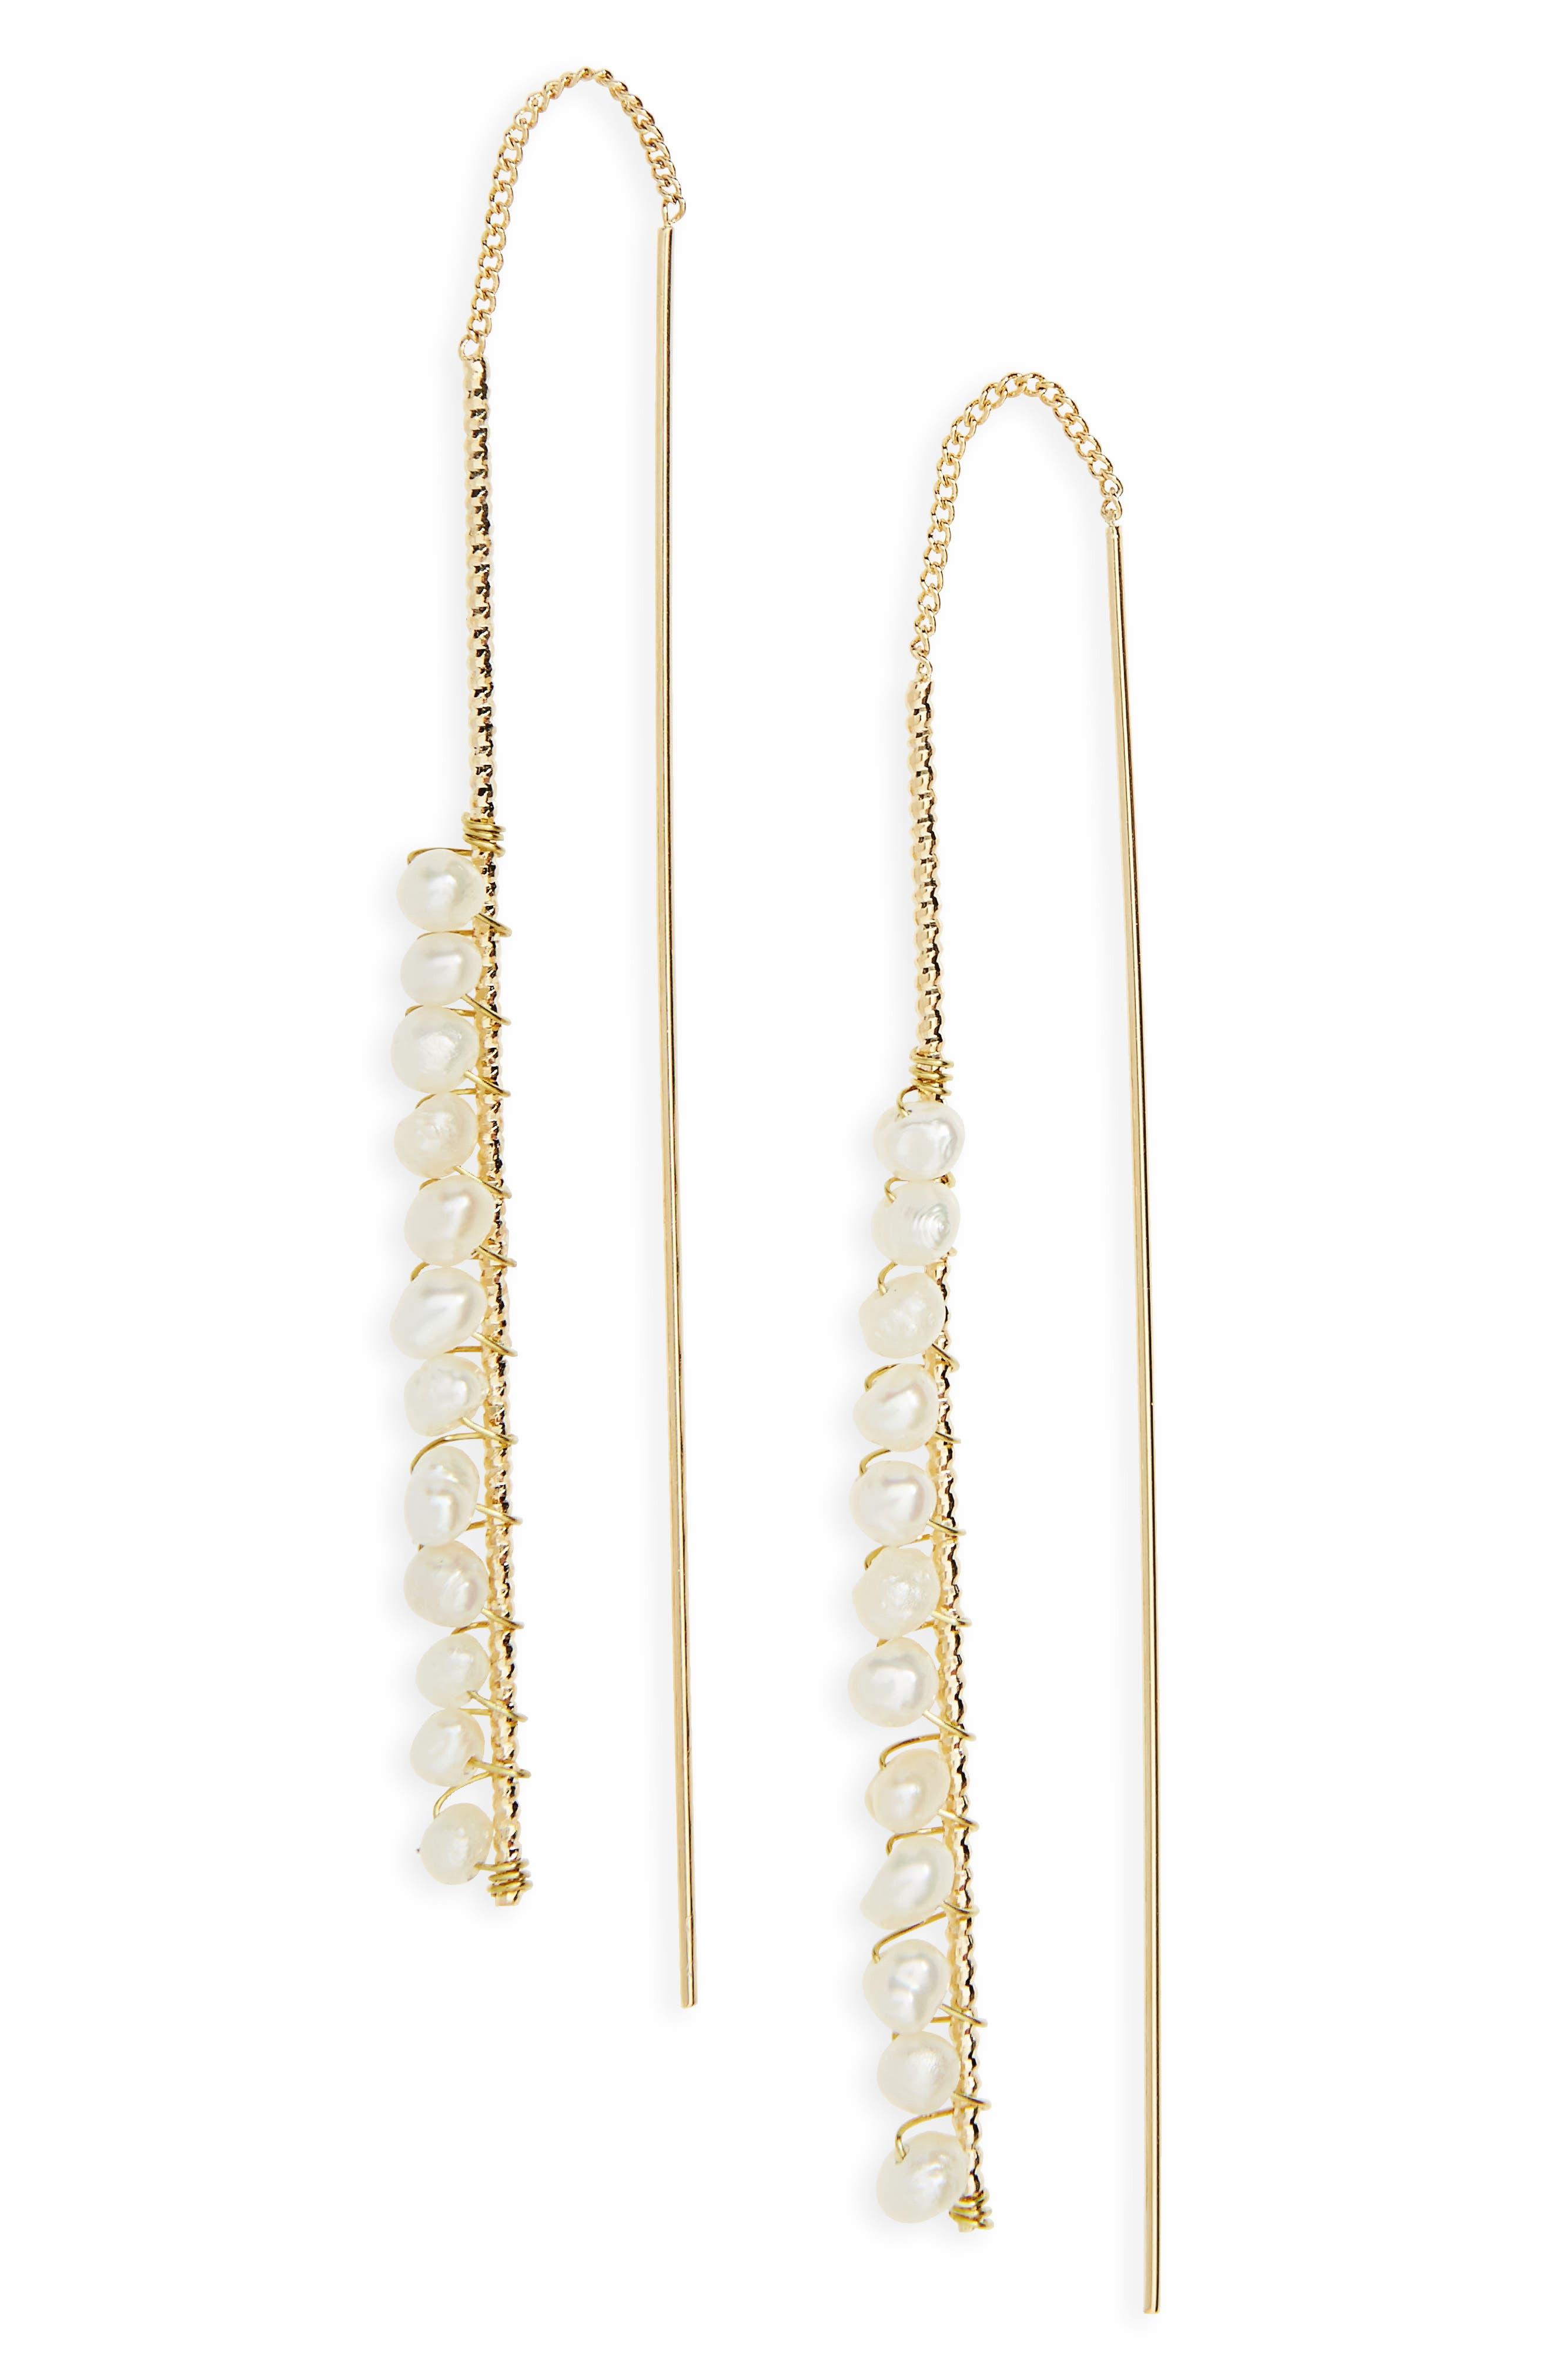 Freshwater Pearl Linear Threader Earrings,                         Main,                         color, White